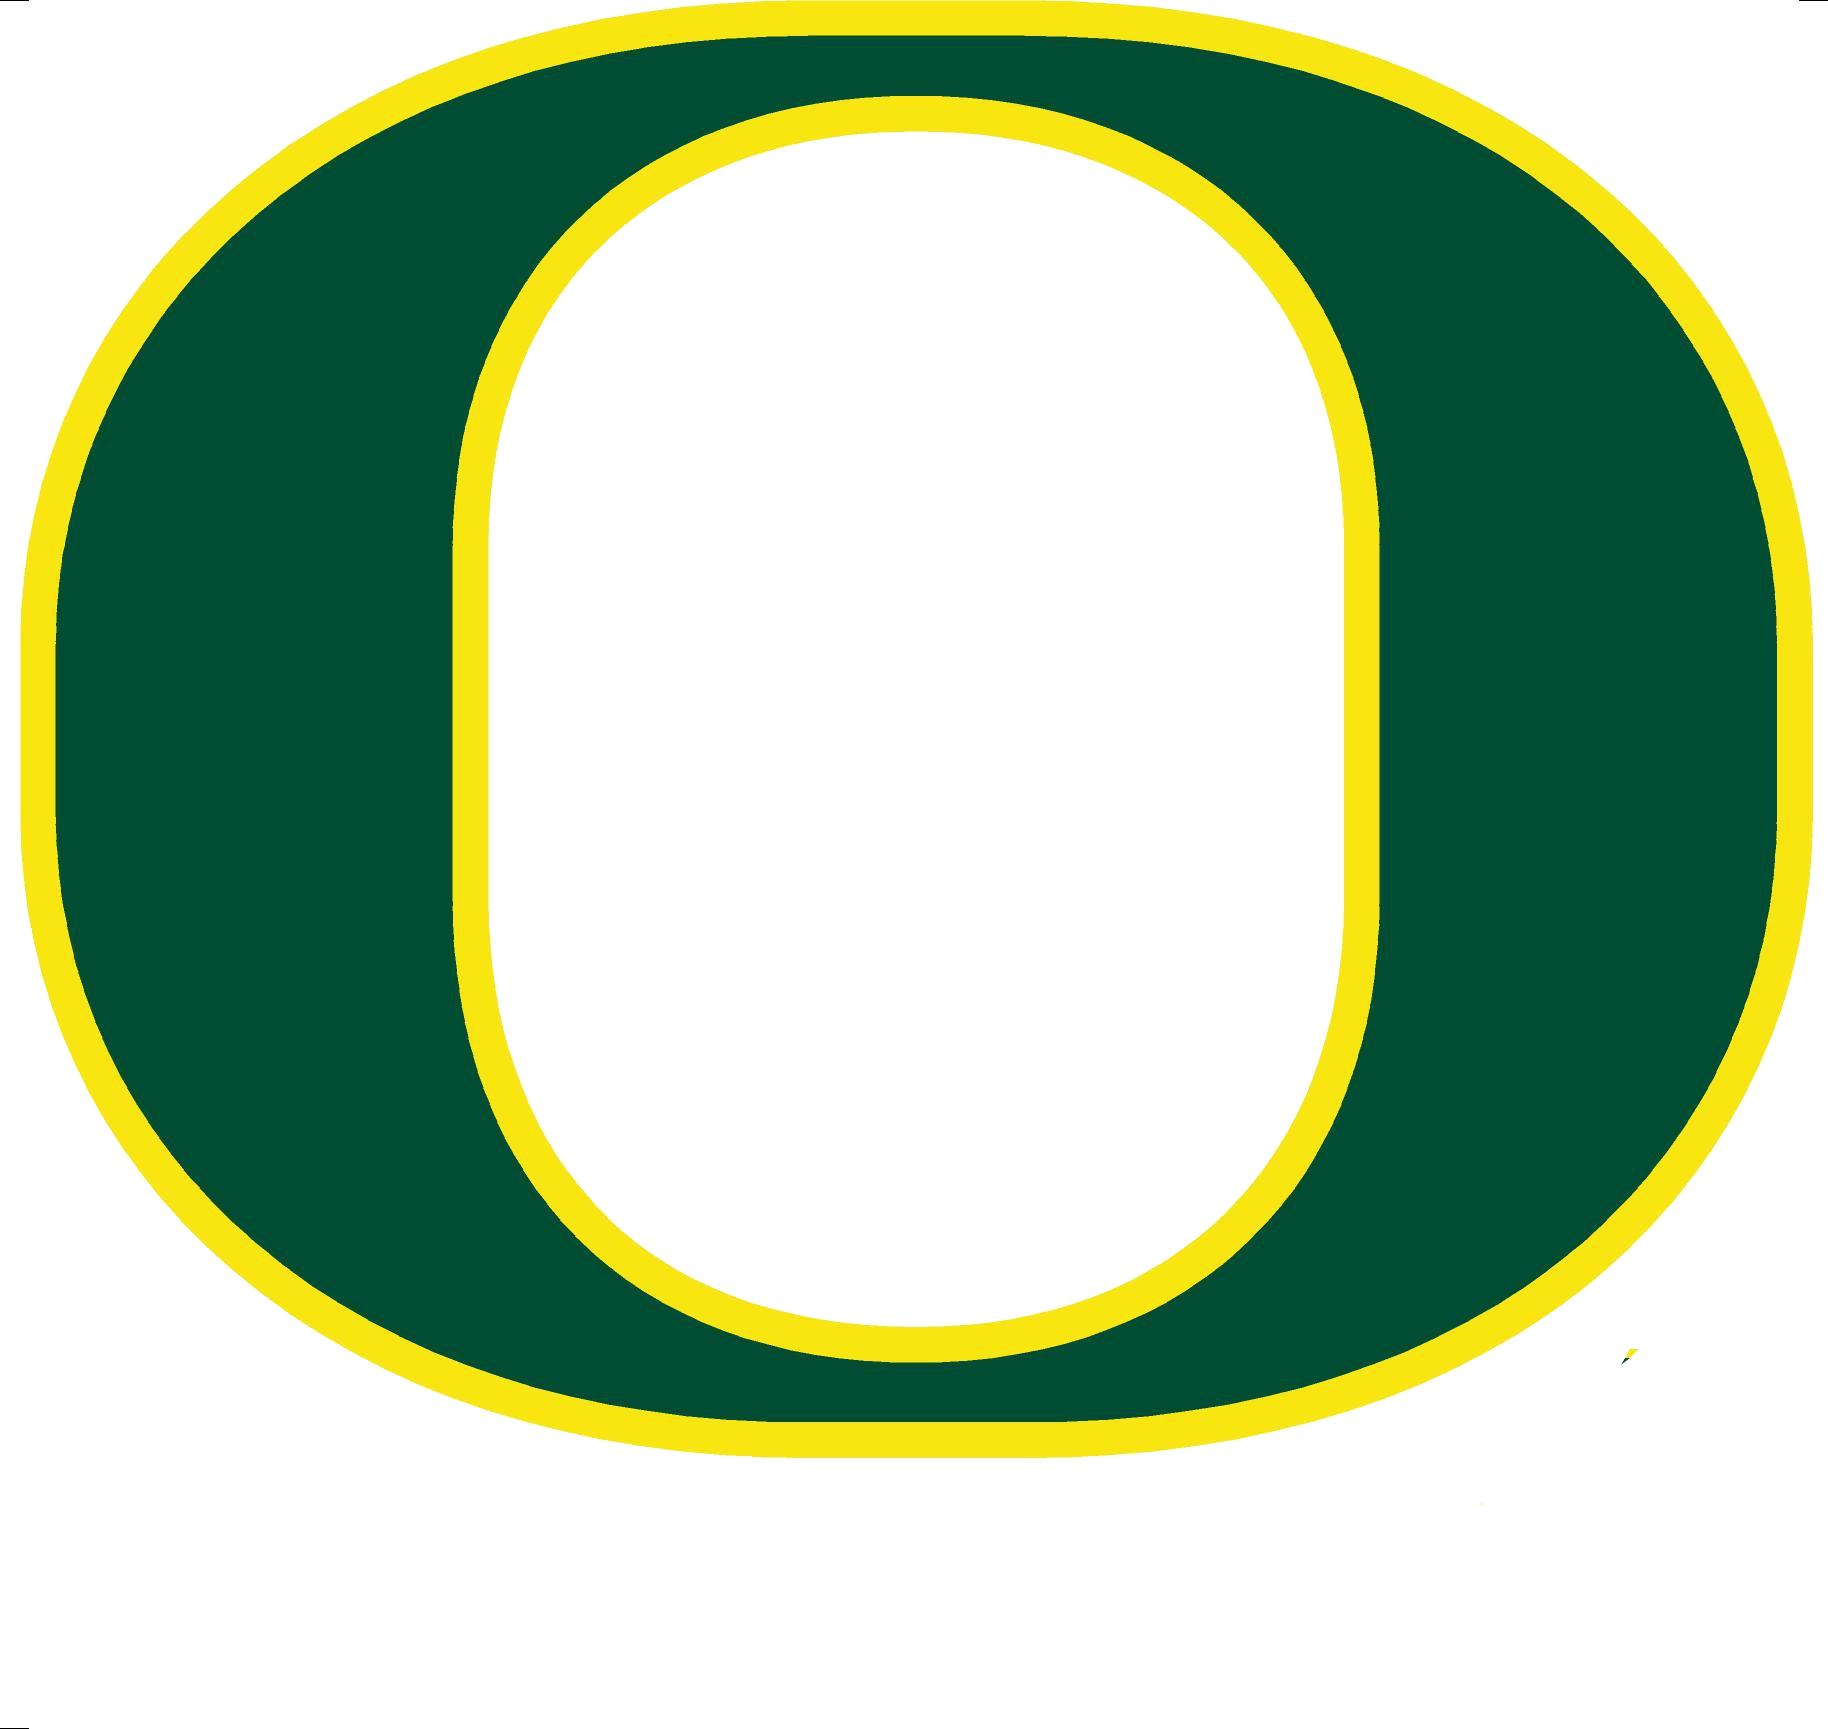 University of Oregon (DI) </a><strong>Emanuel Martins</strong>